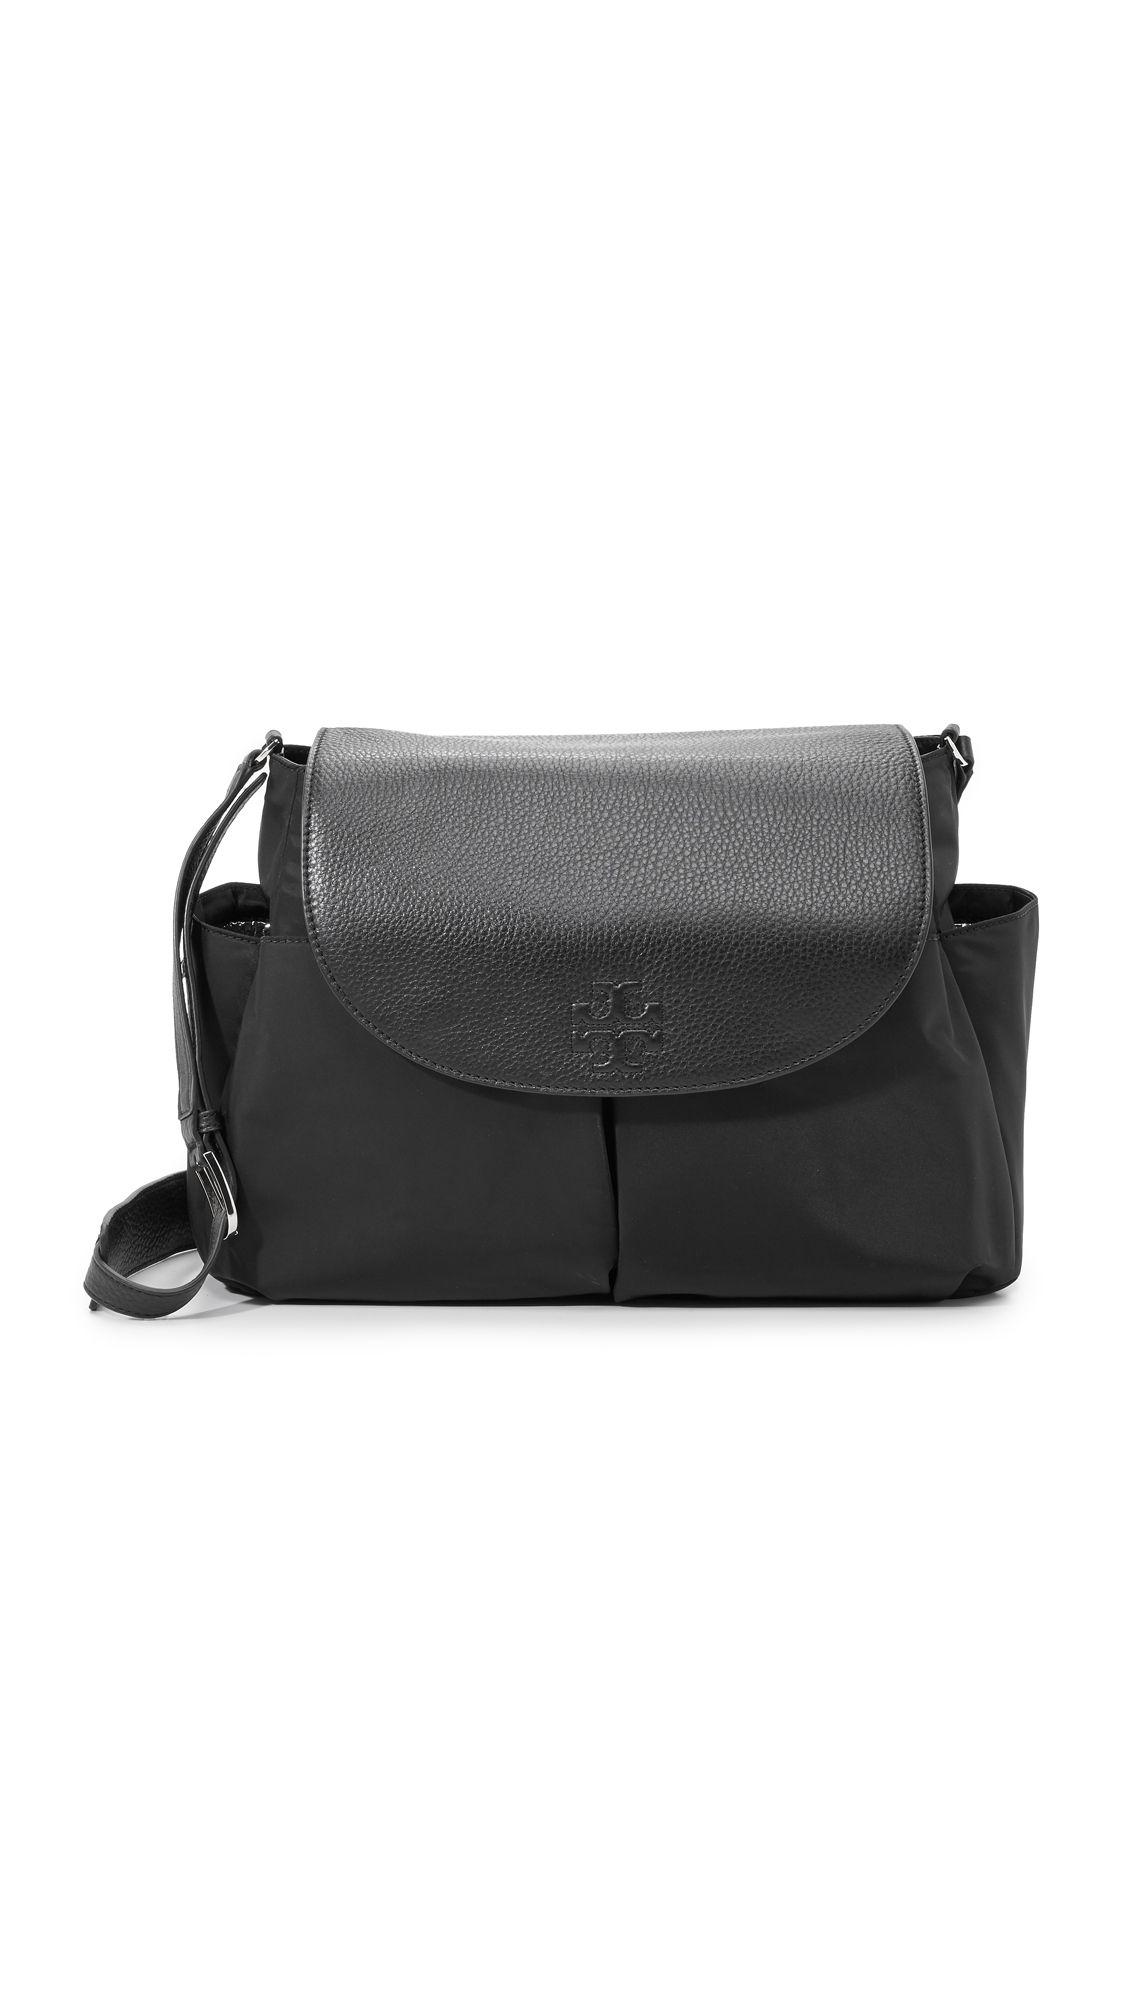 26d55d3d10 Tory Burch Thea Nylon Diaper Bag | Maternity Style | Bags, Baby ...